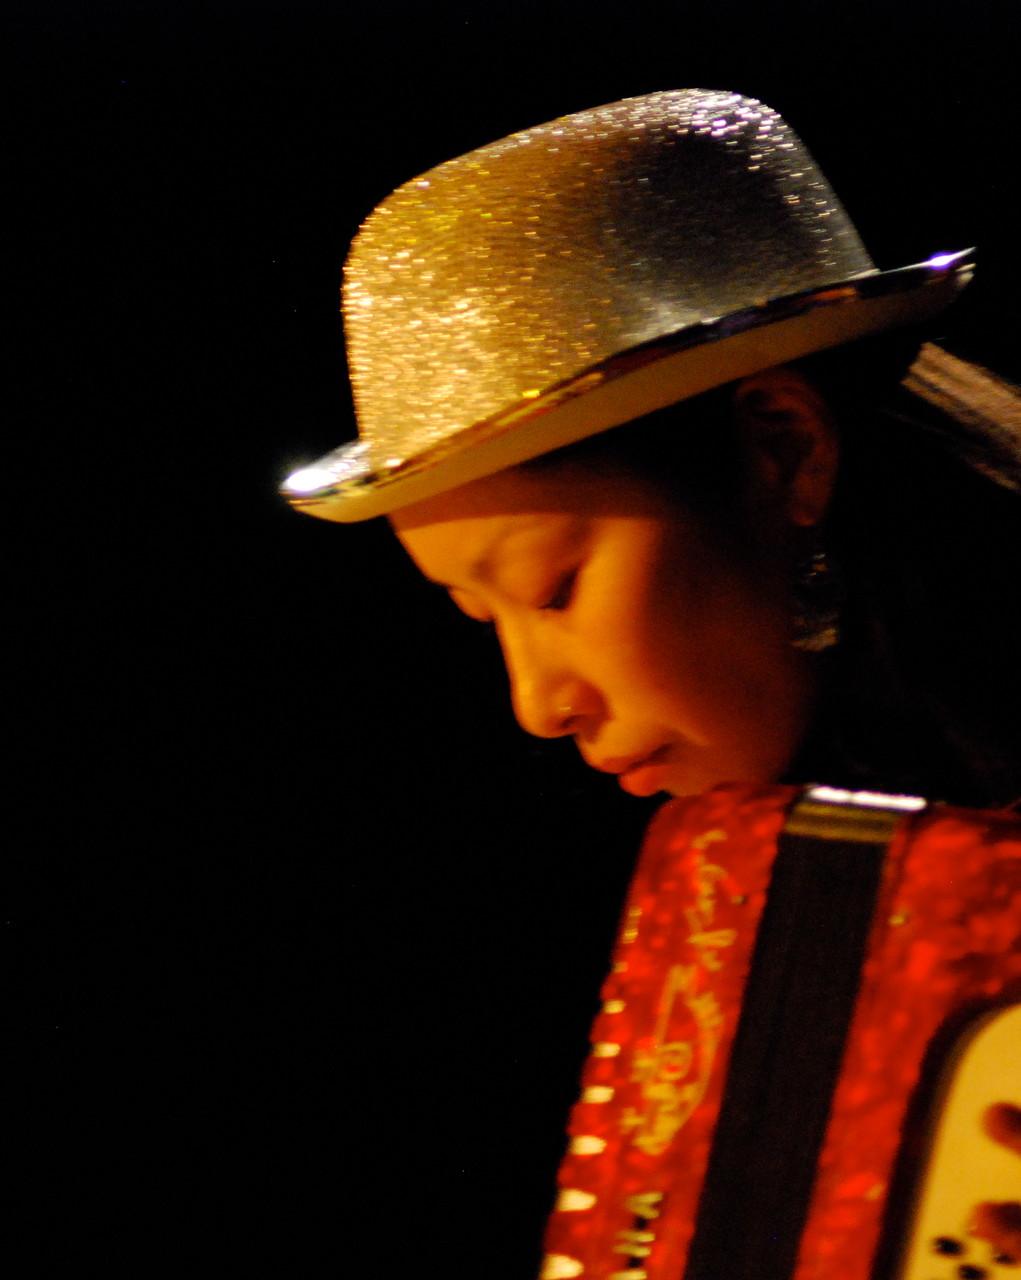 photo by Yuzuru Masuda